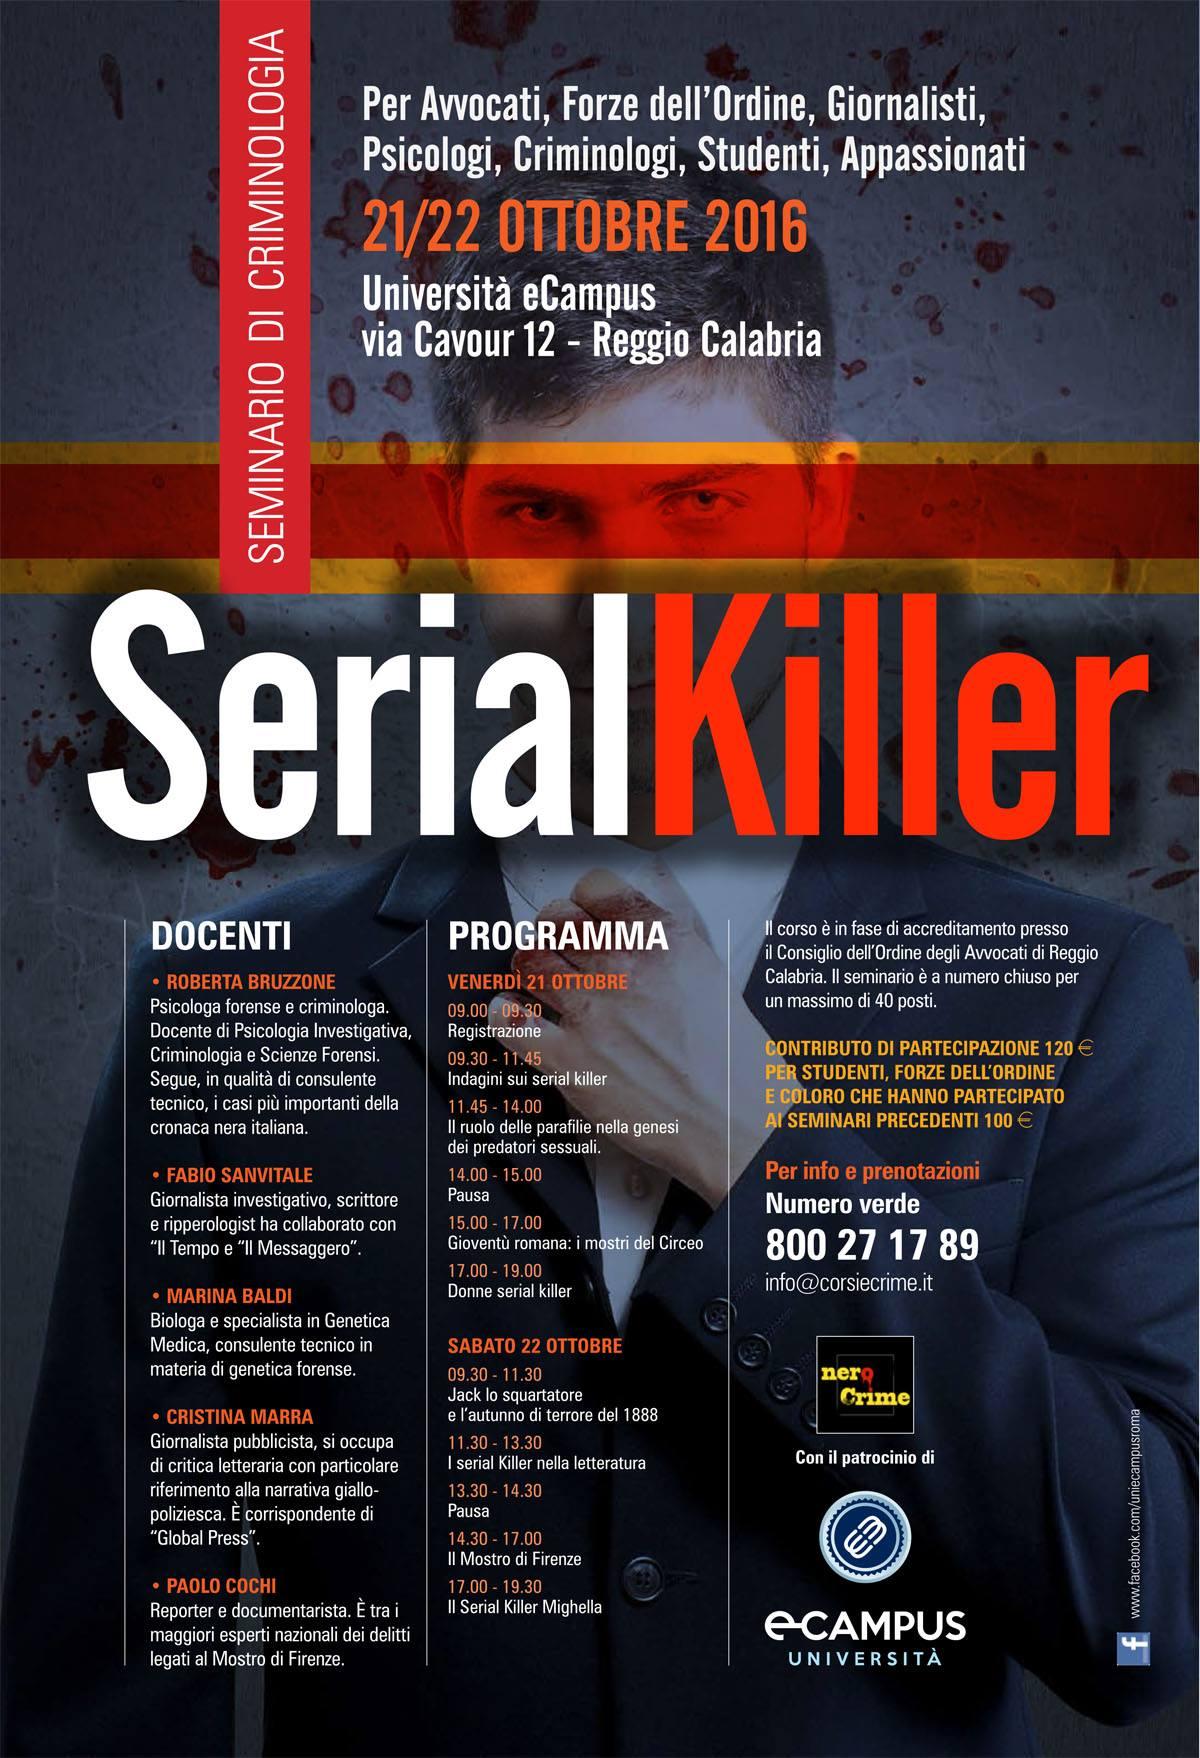 Serial Killer Torino